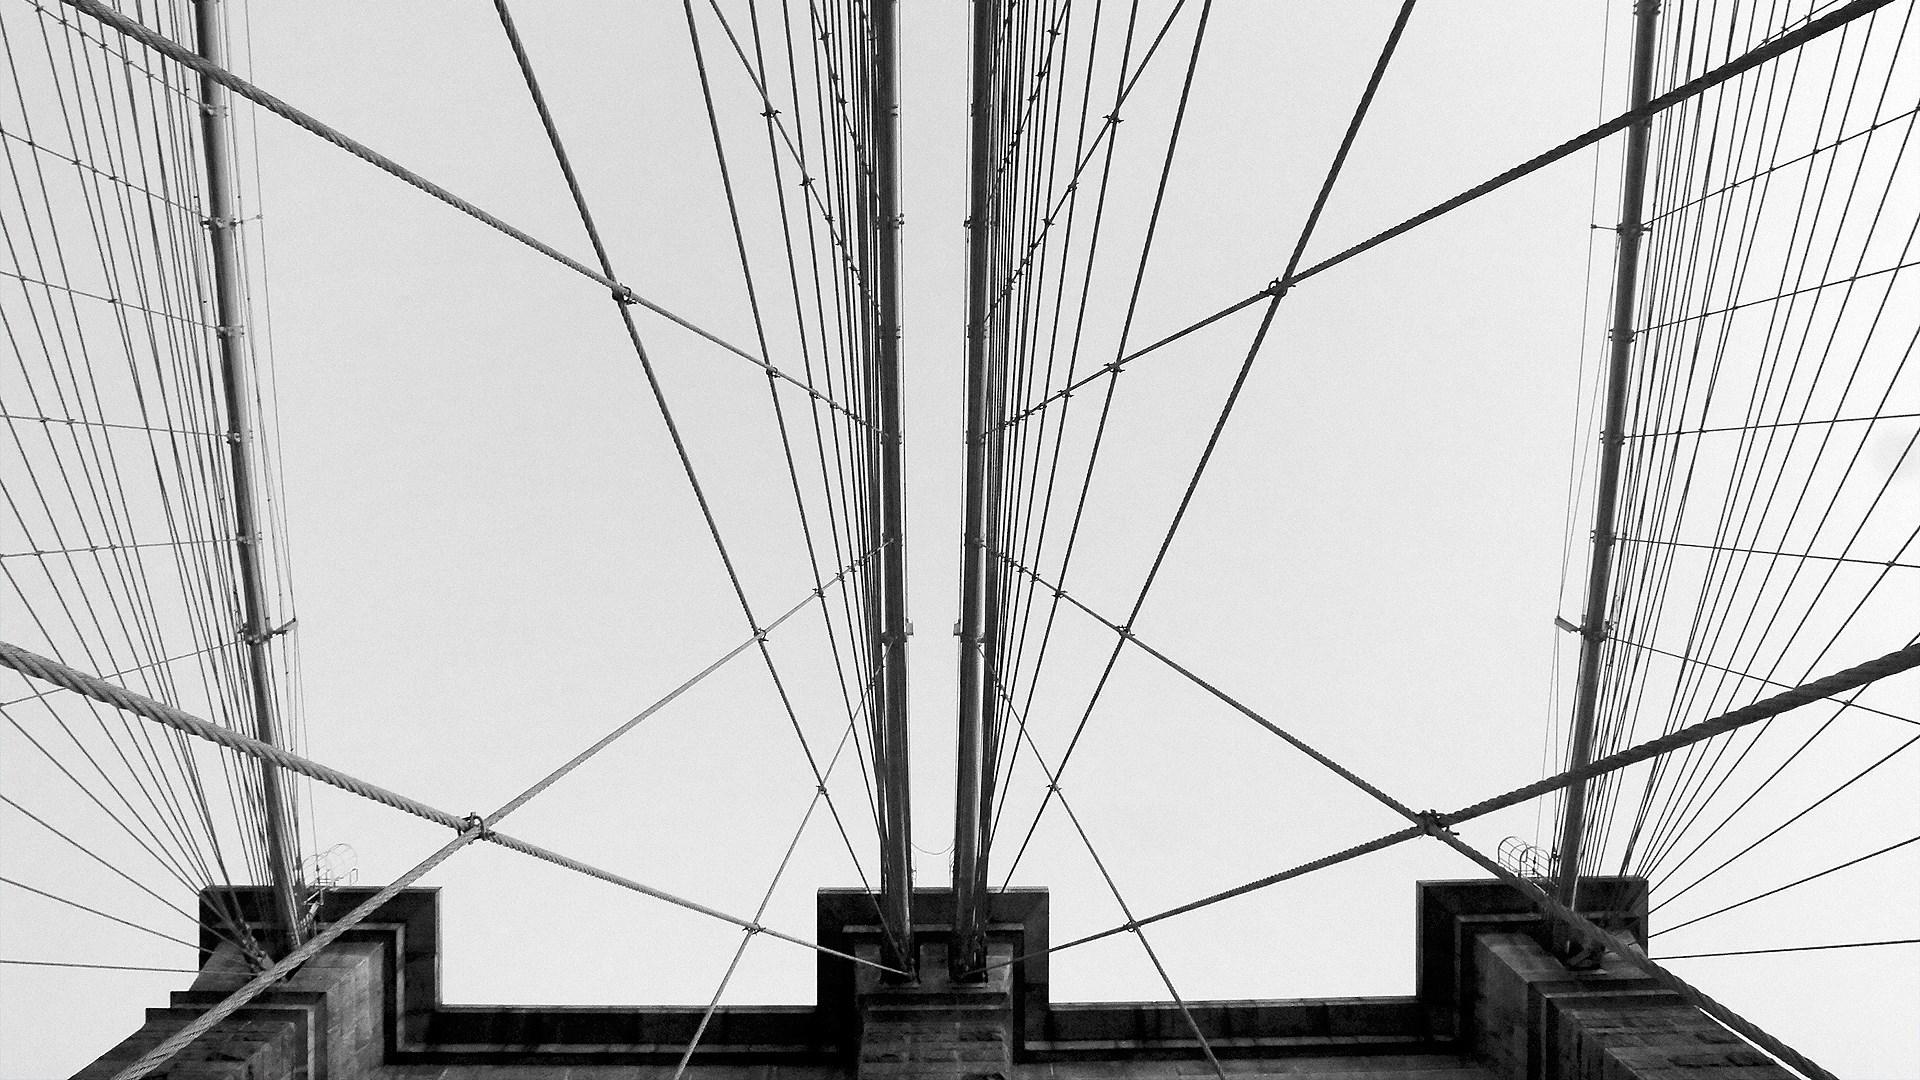 1920x1080-desktop-for-bridge-wallpaper-wp340768